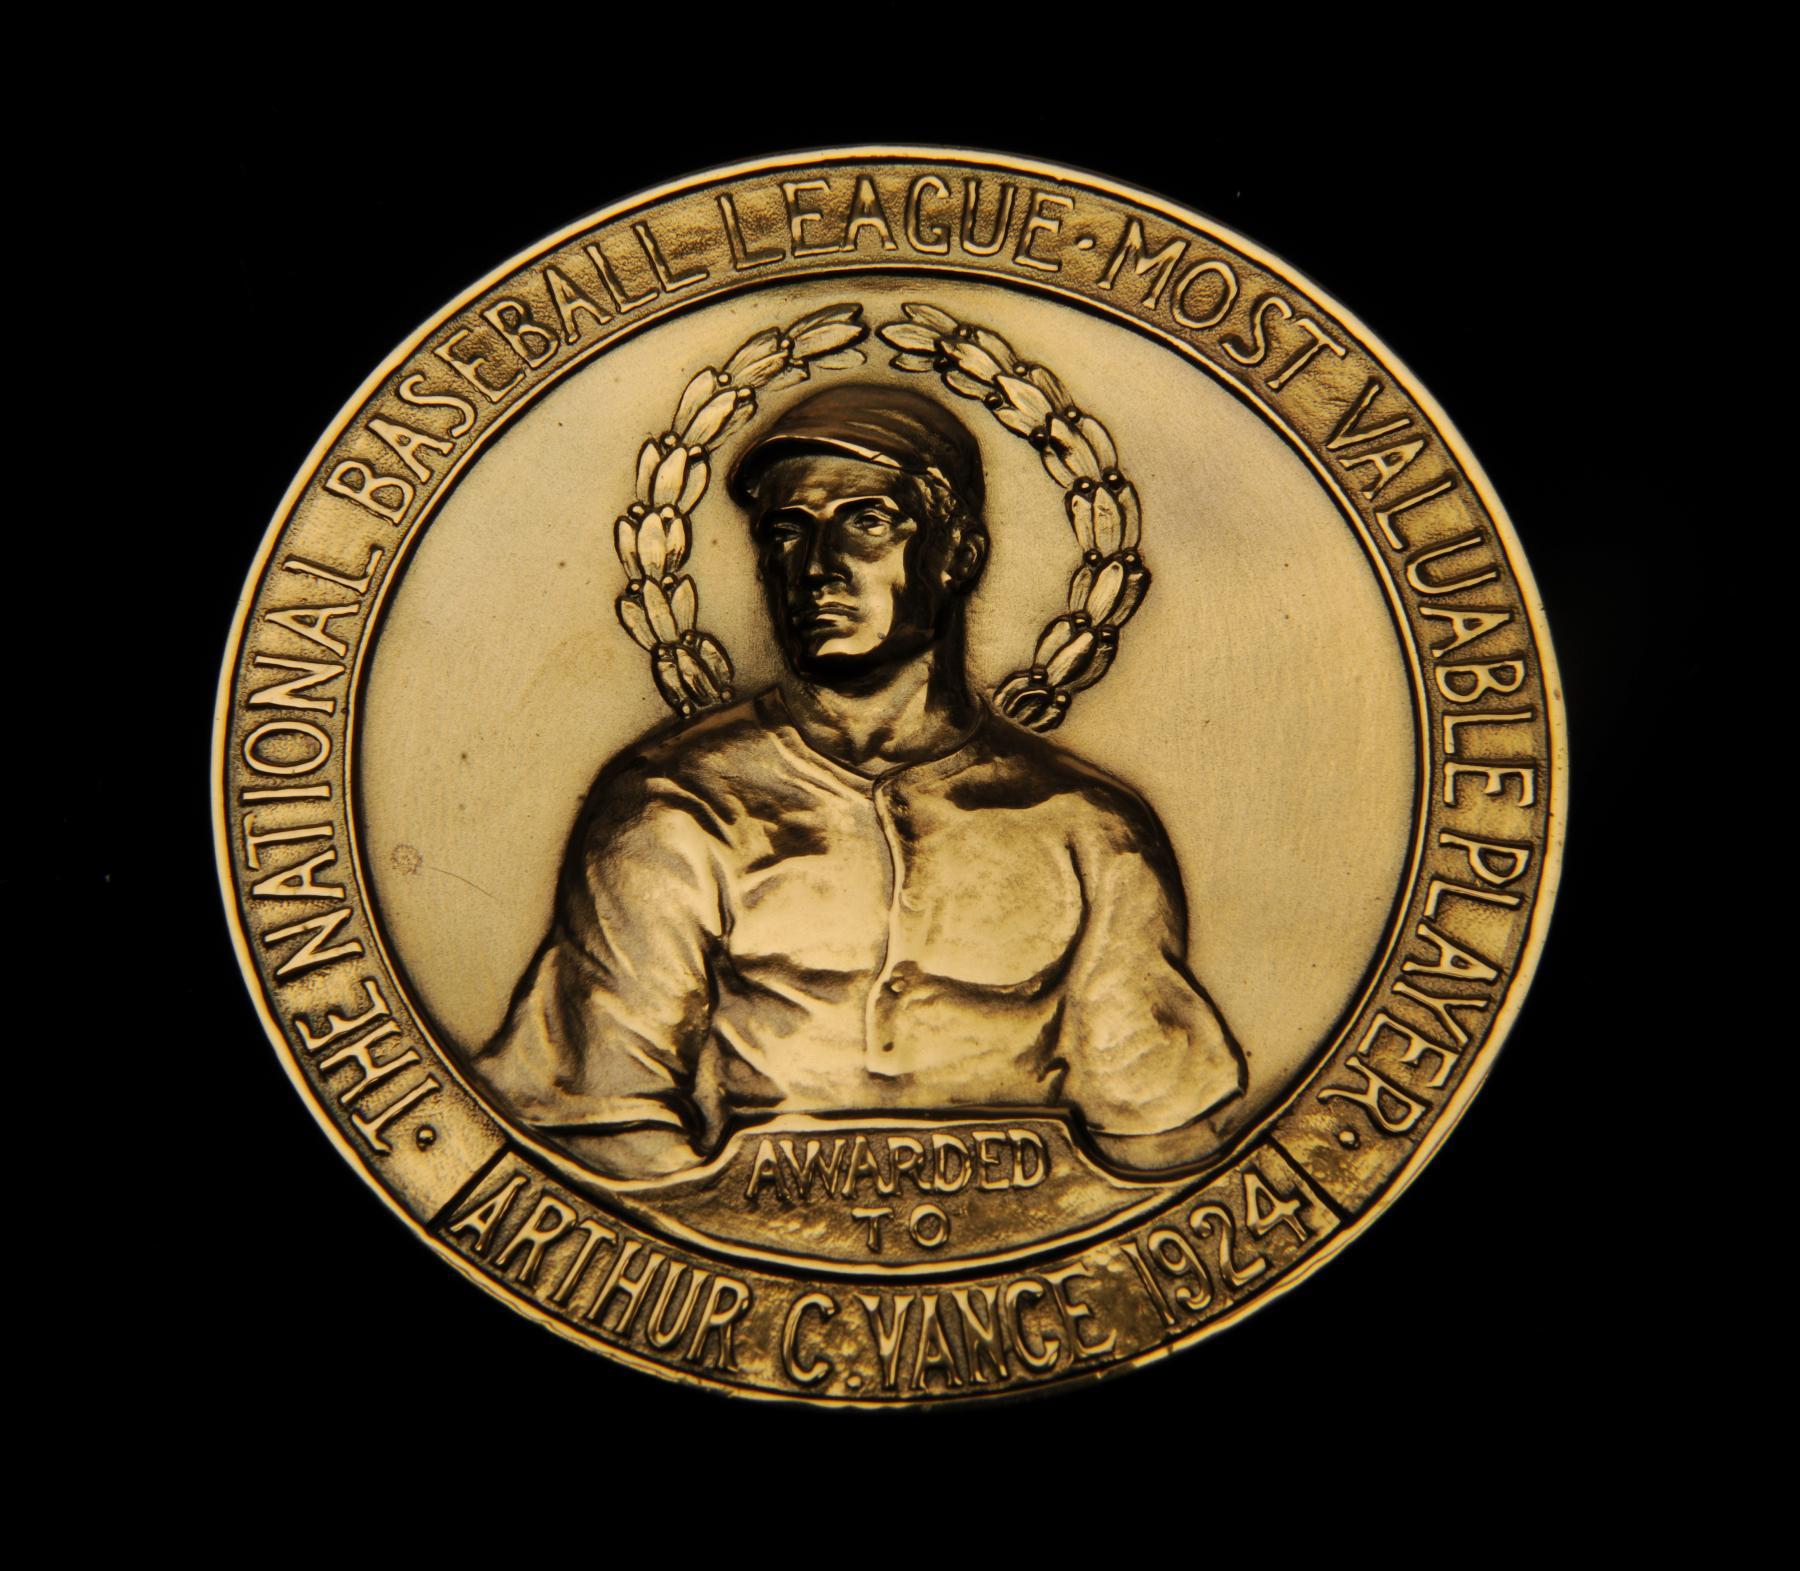 Award_Vance%20Dazzy%20MVP%20medal_B-235-